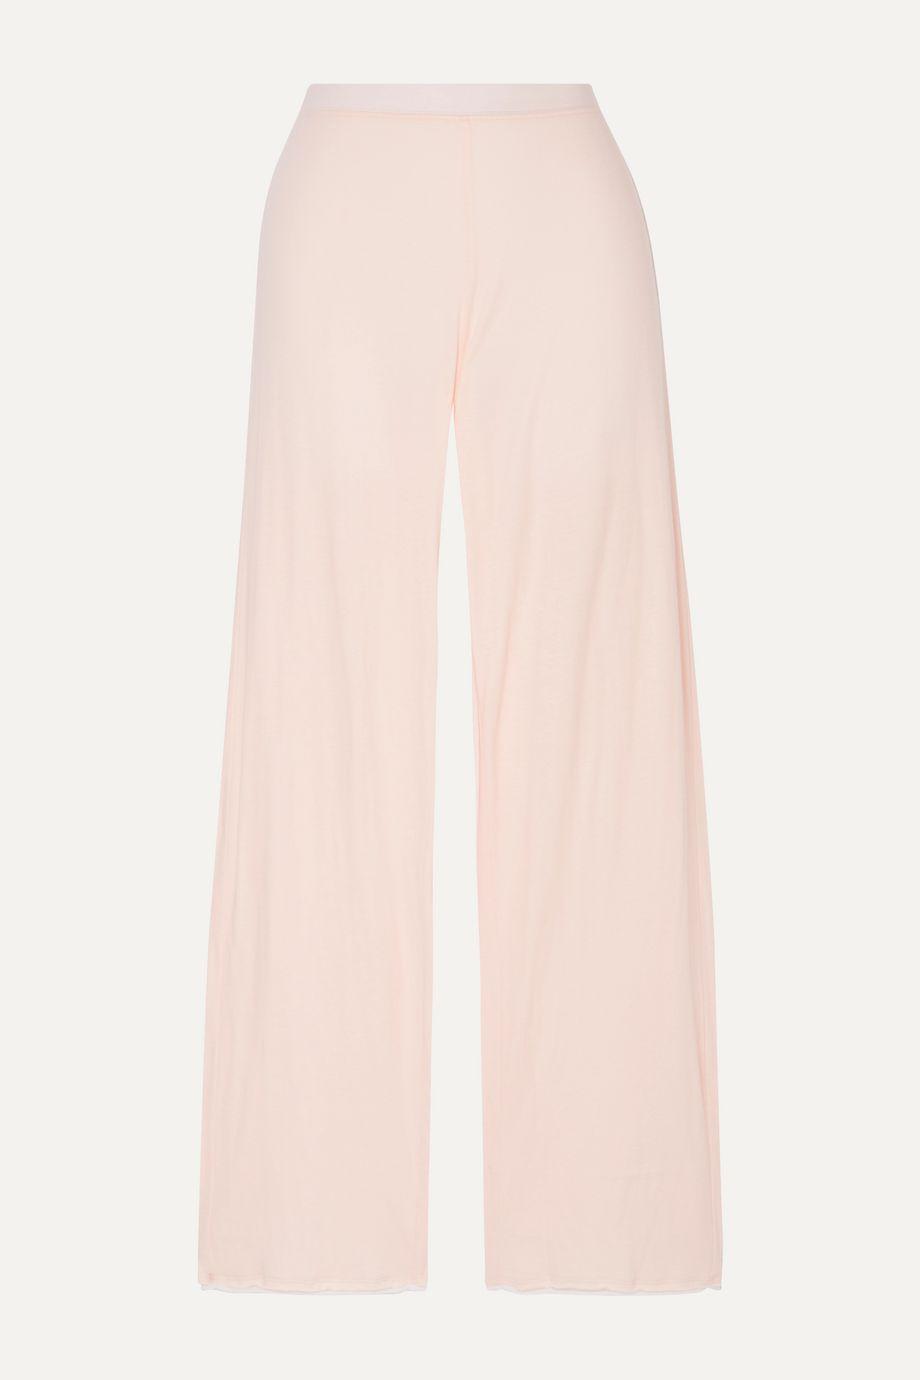 Skin Greta organic Pima cotton-jersey pajama pants